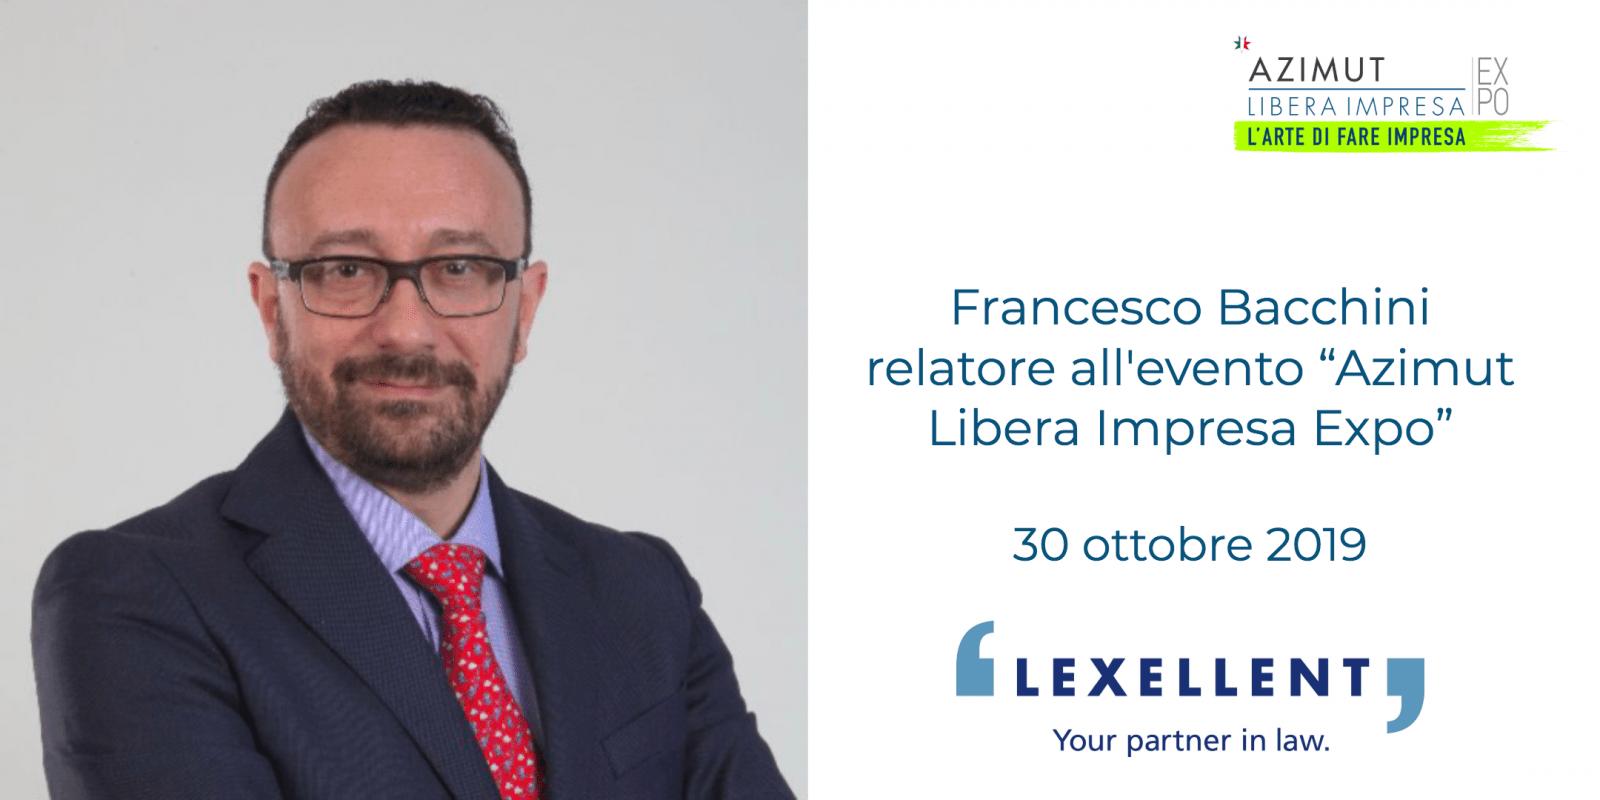 "Francesco Bacchini relatore all'evento ""AZIMUT LIBERA IMRESA EXPO"""